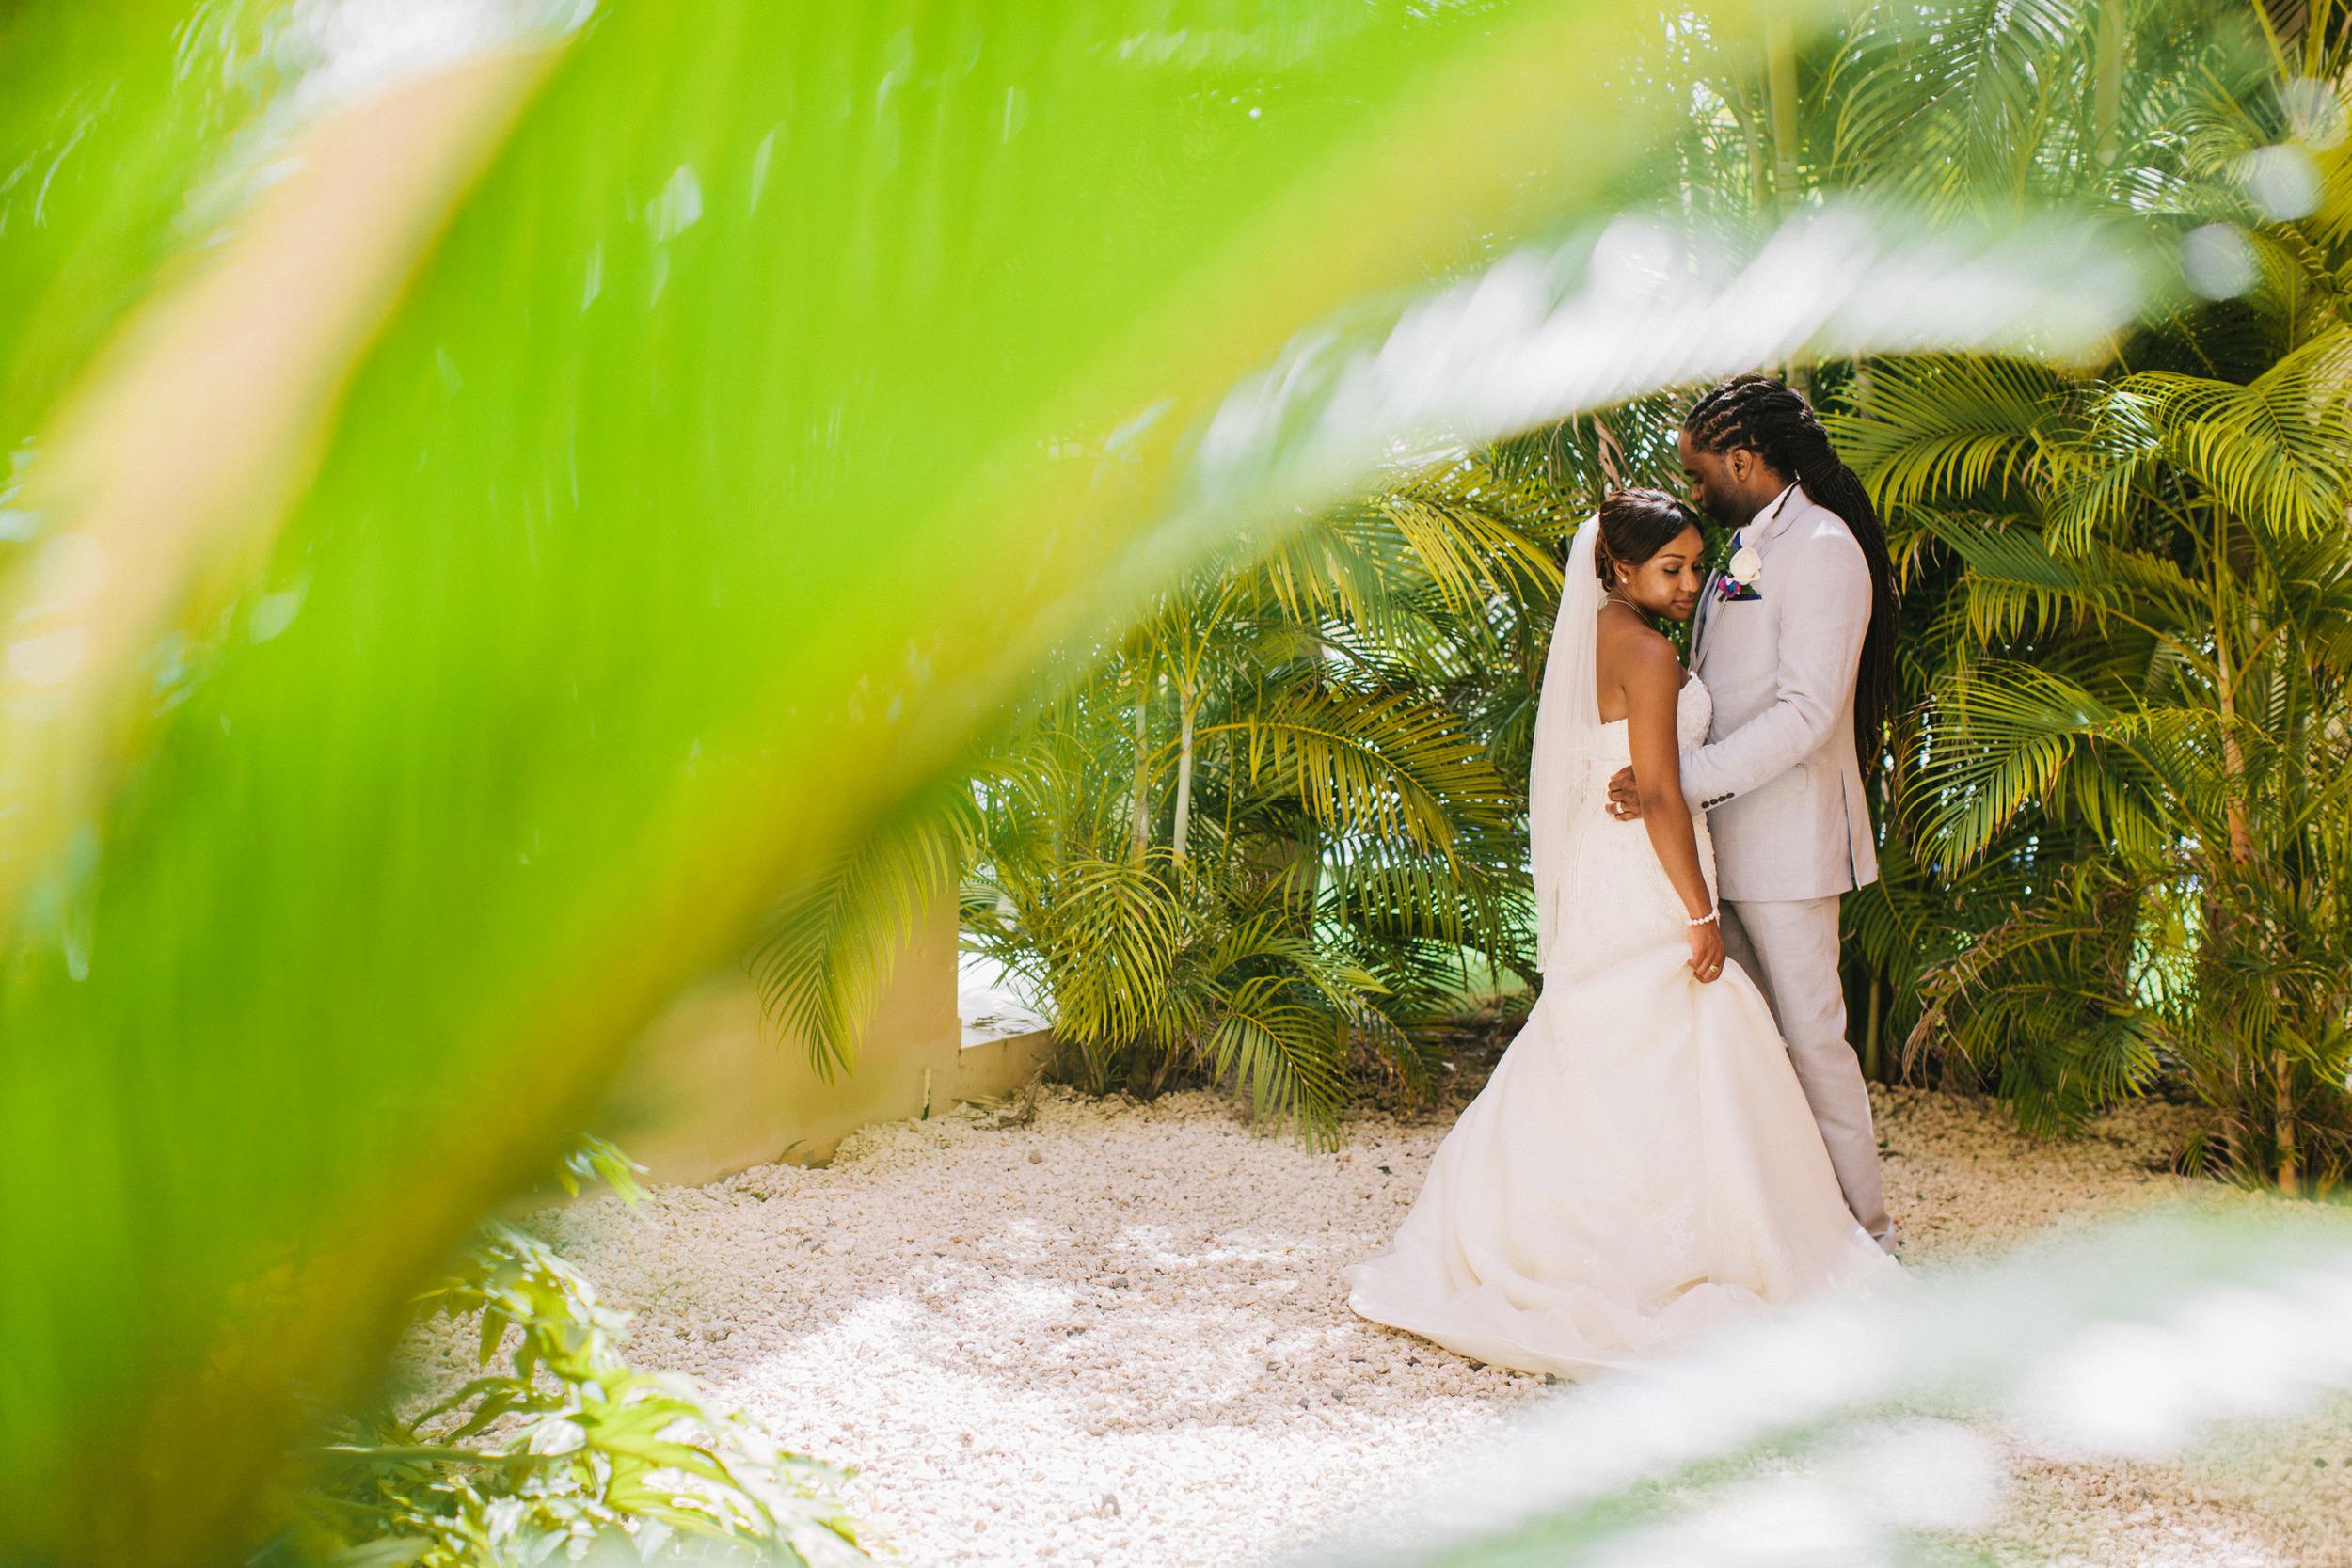 michael-rousseau-photography-dominican-republic-destination-wedding-cara-jason-colonial-majestic-dominican-republic086.jpg